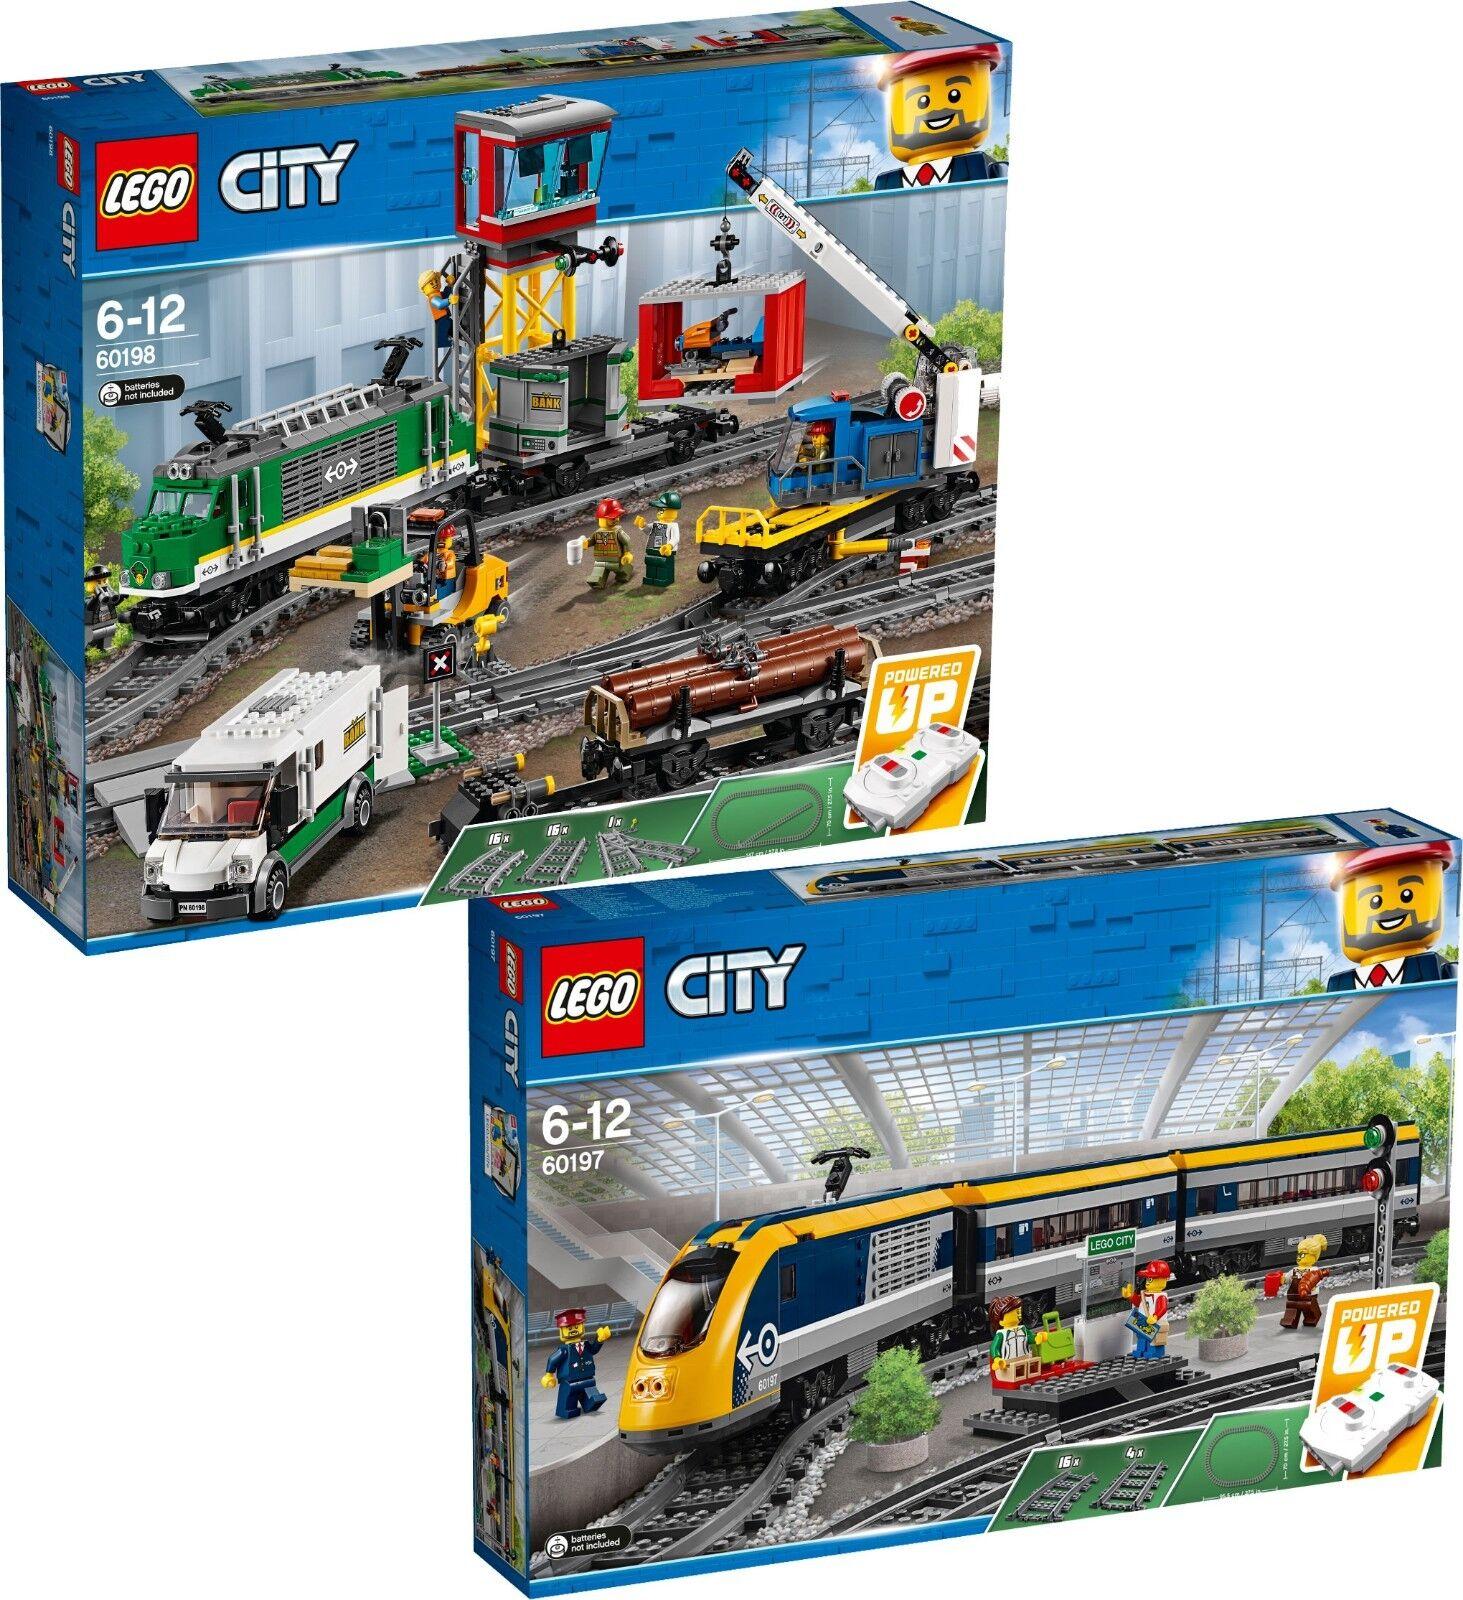 LEGO City 60198 TRENO MERCI CARGO TRAIN e 60197 treno n9/18